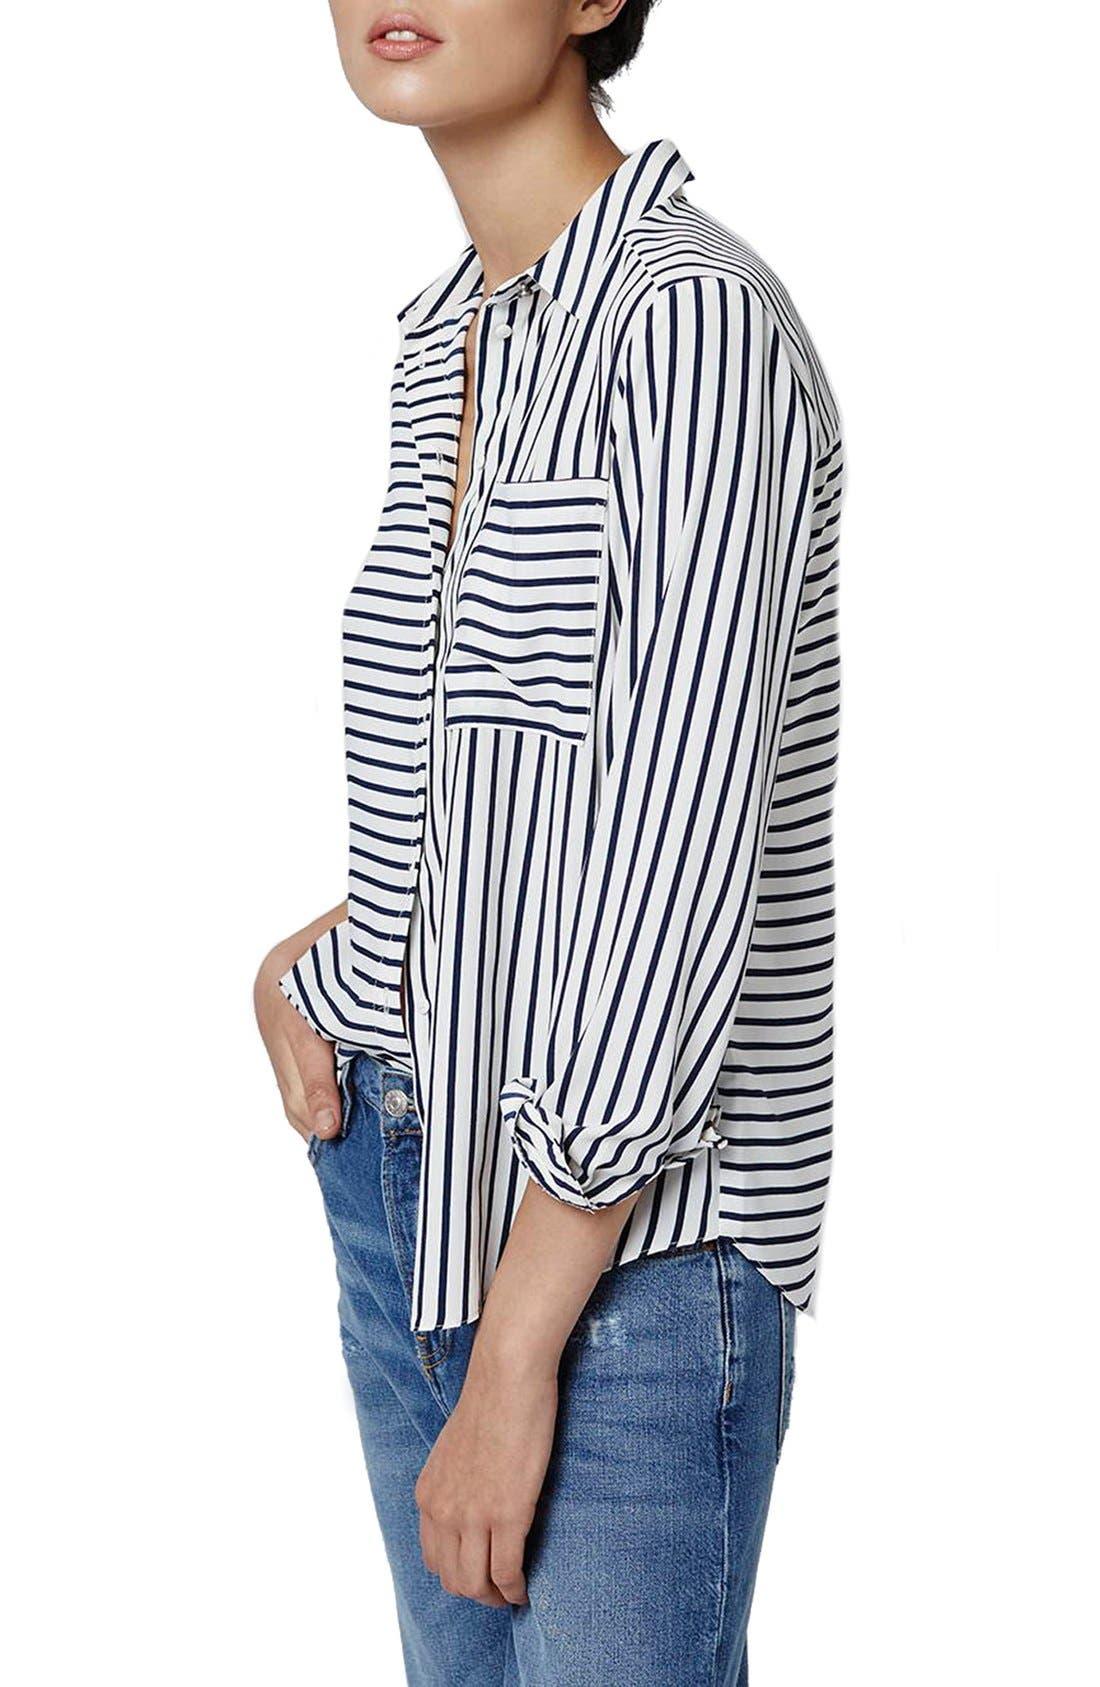 Alternate Image 1 Selected - Topshop 'Olivia' Paneled Stripe Shirt